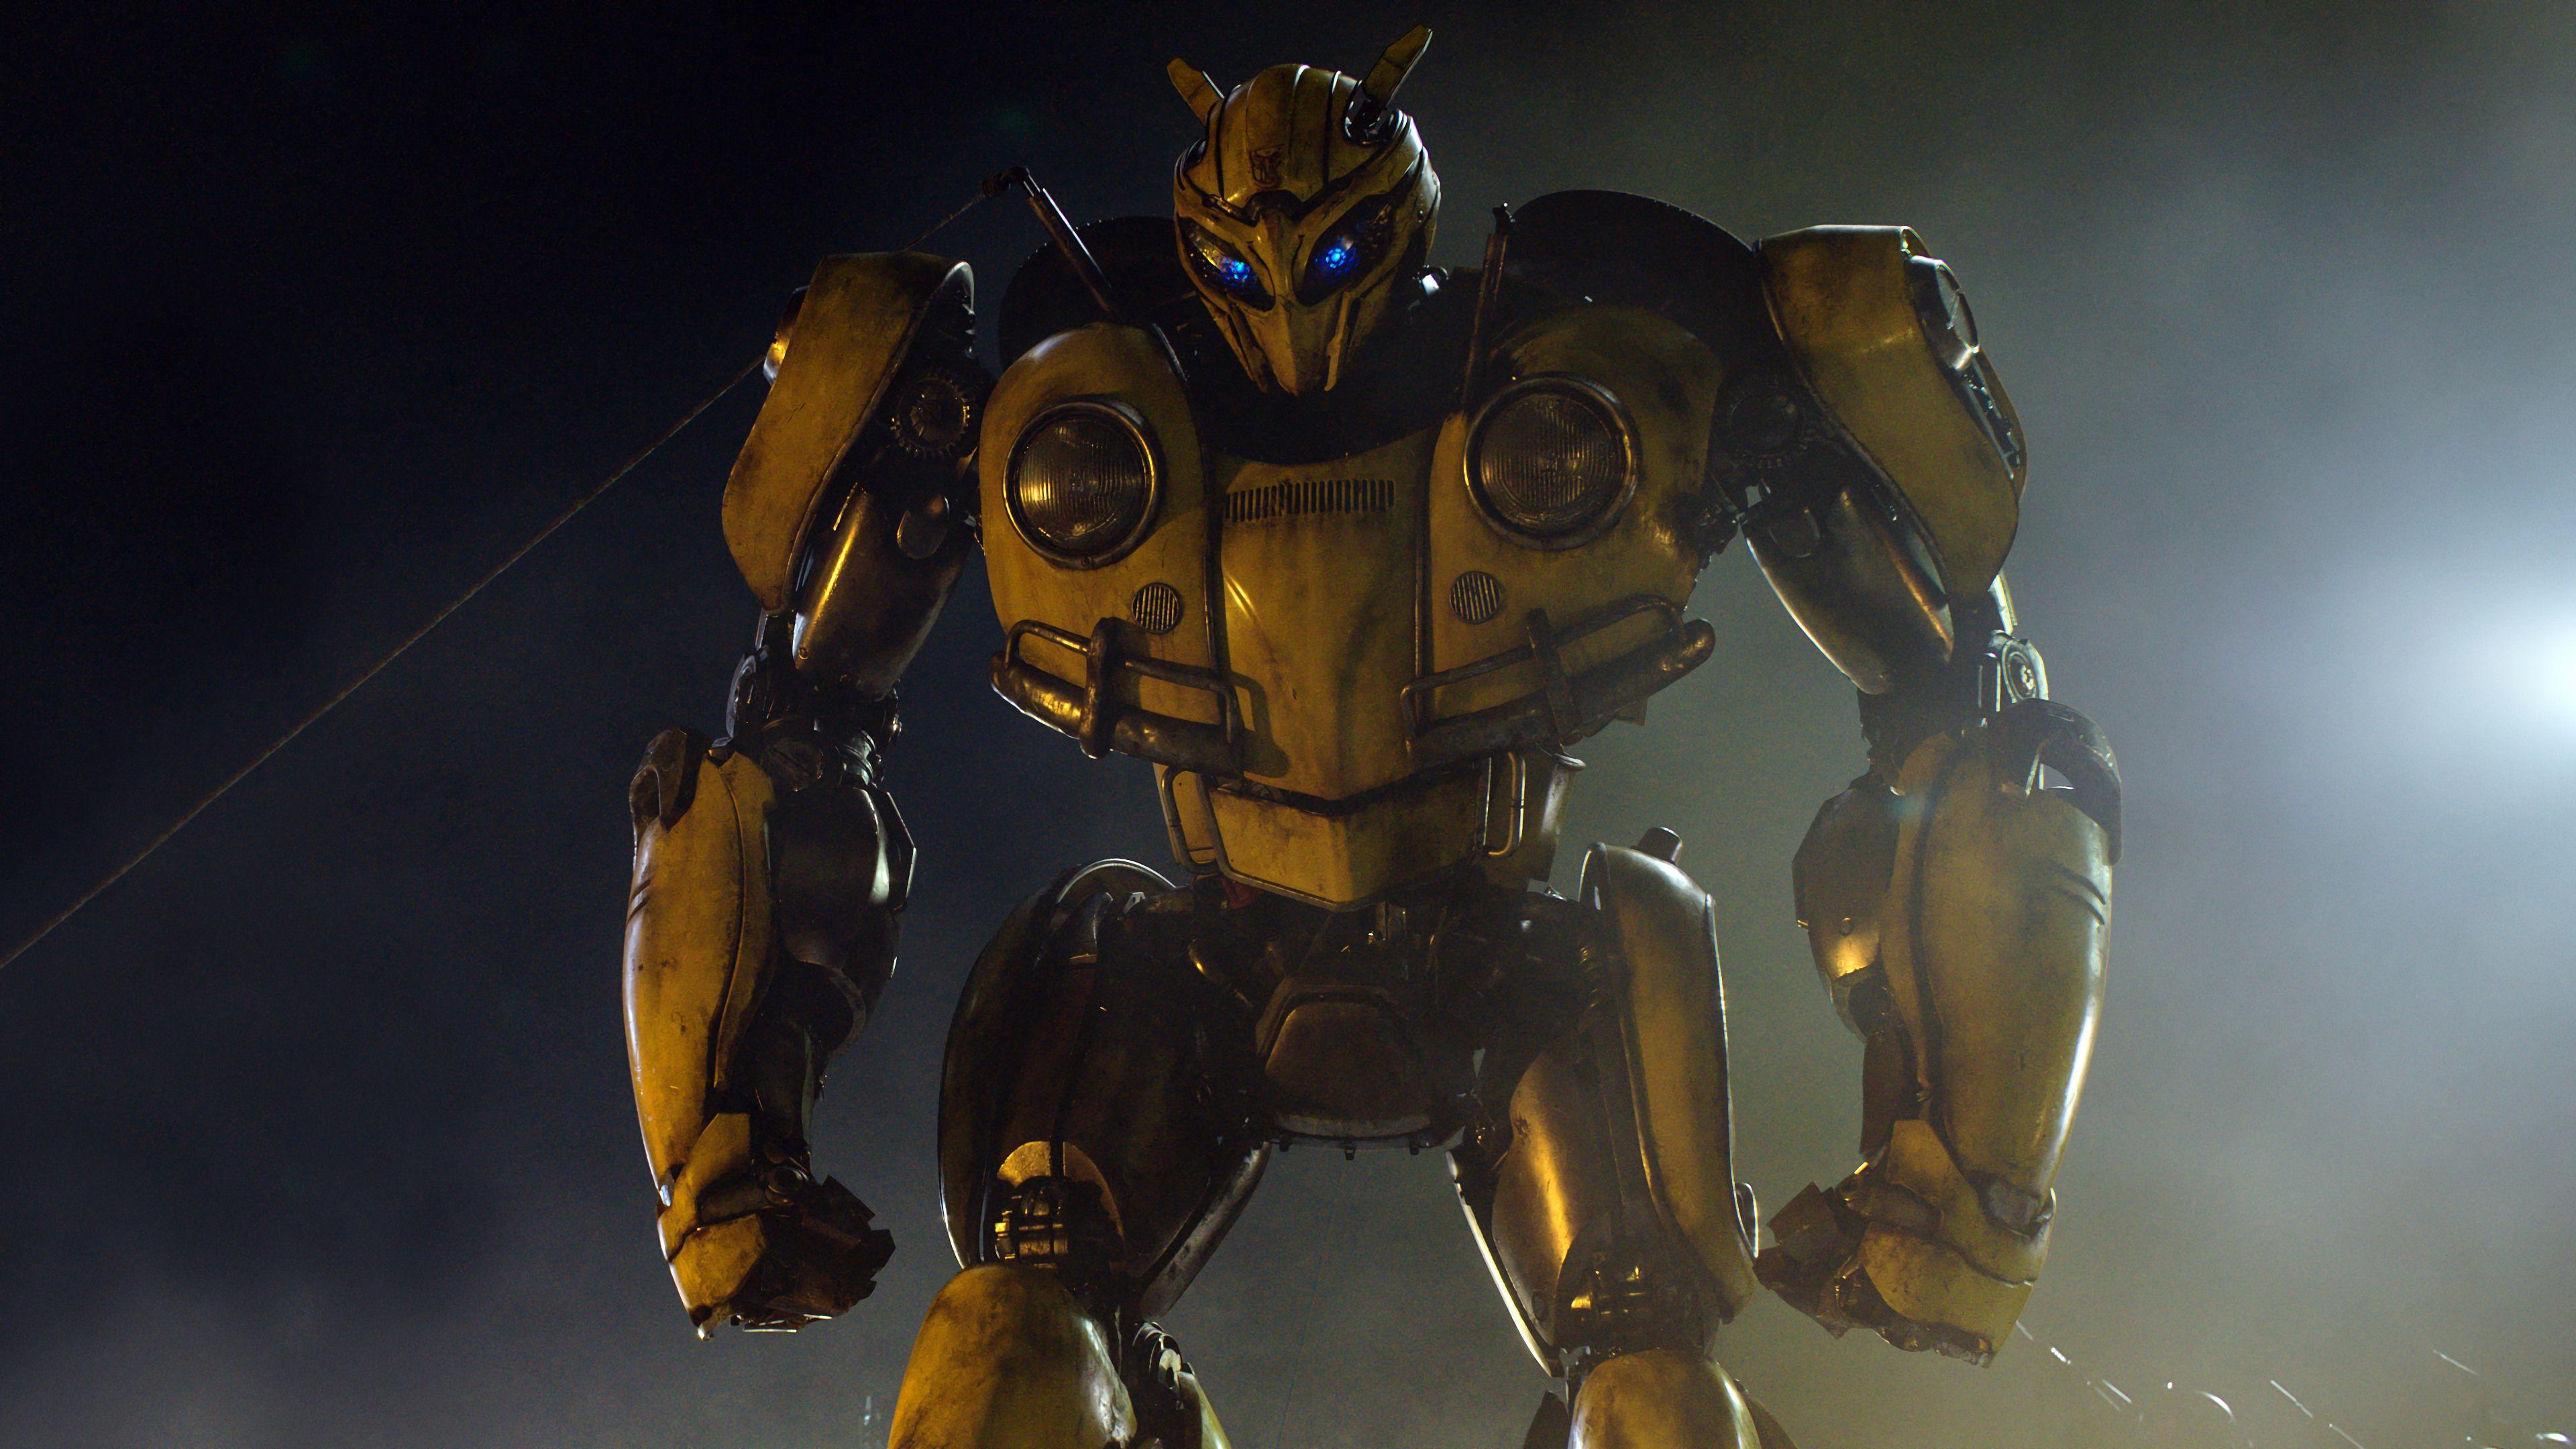 Wallpaper Transformer Bumblebee 002 Resized For Iphone X Robotika Ksatria Pahlawan Super